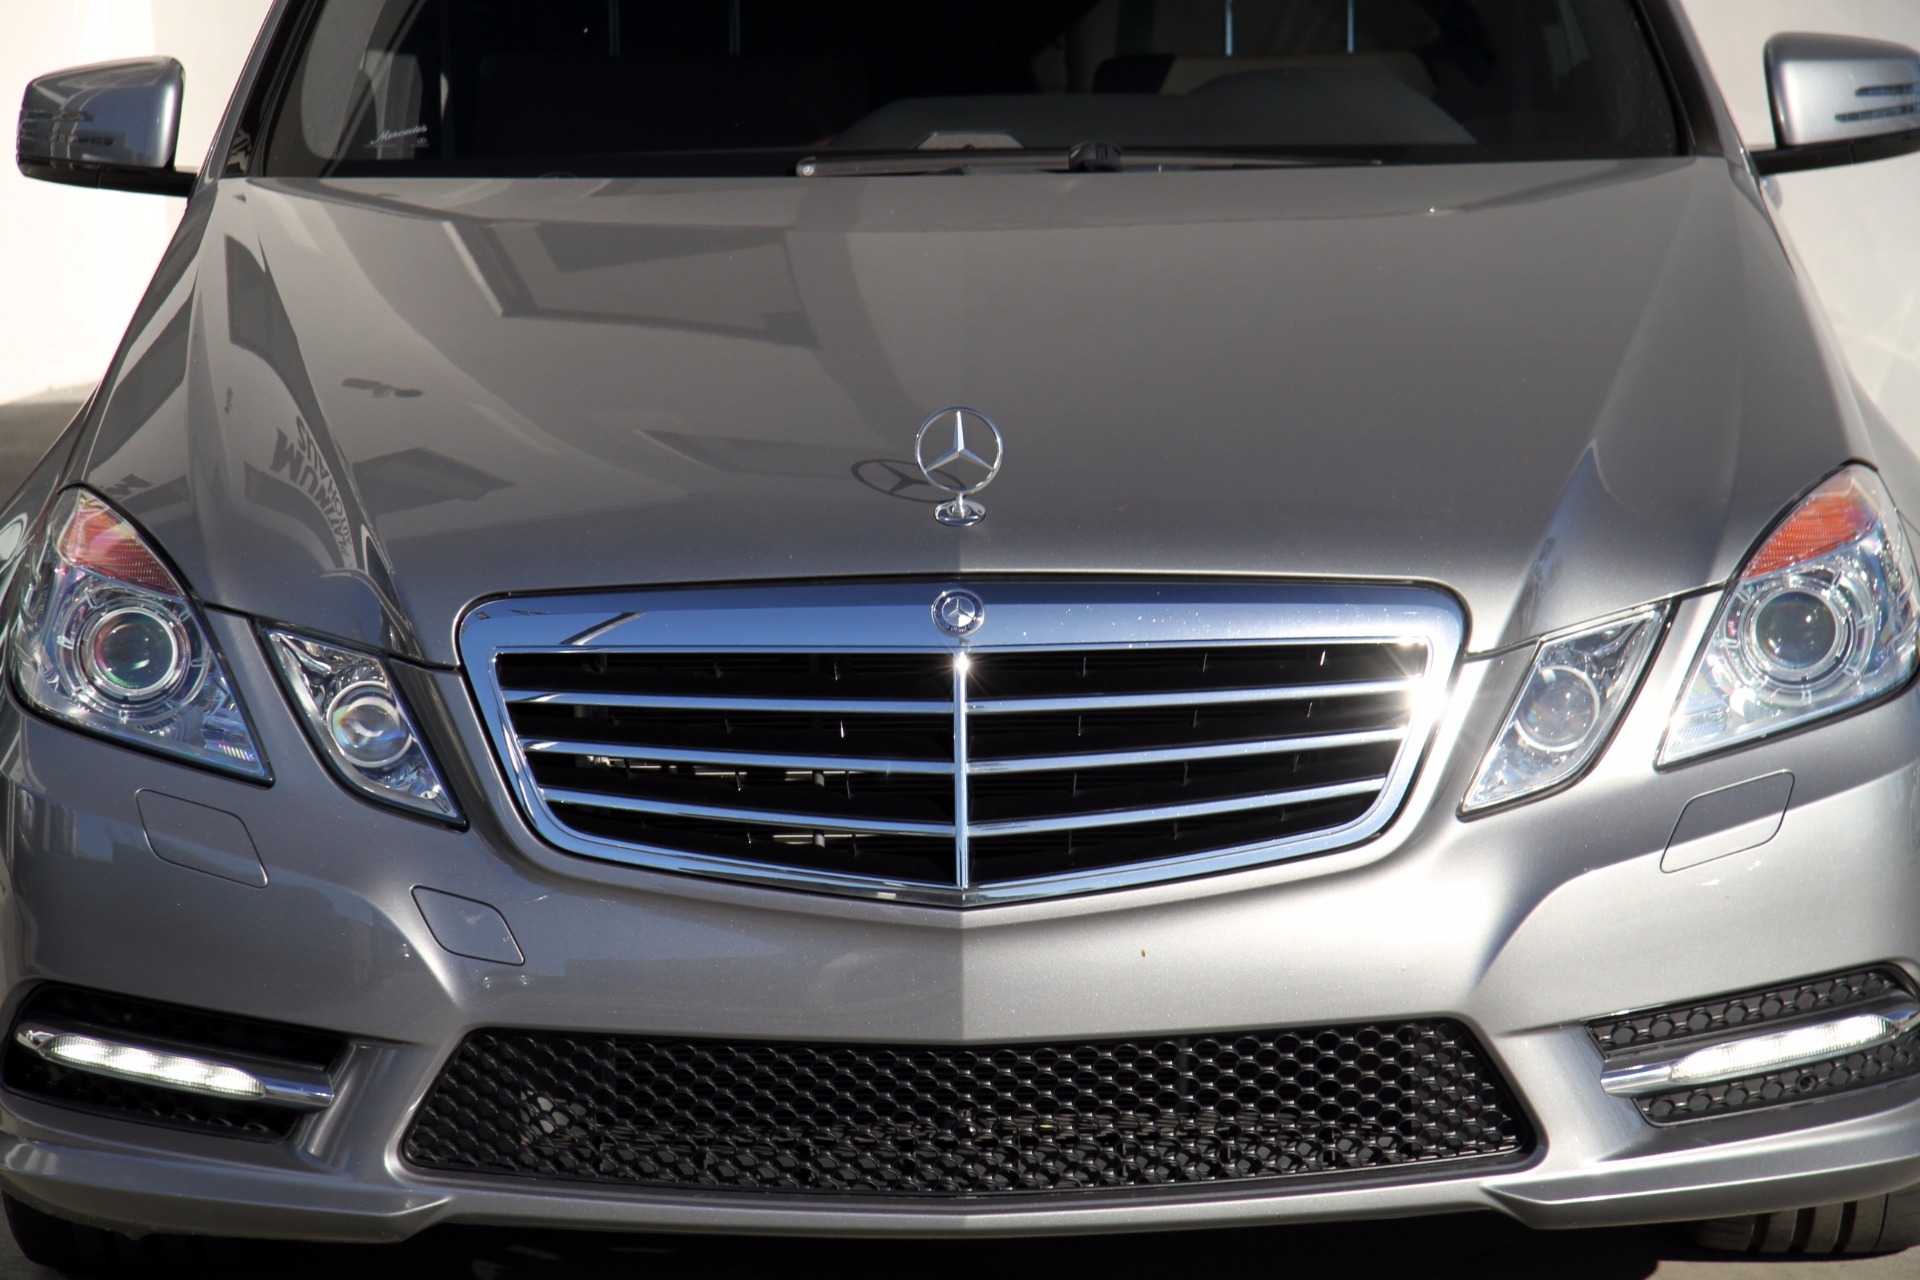 2012 Mercedes Benz E 350 Sport 4matic Wagon Stock 554584